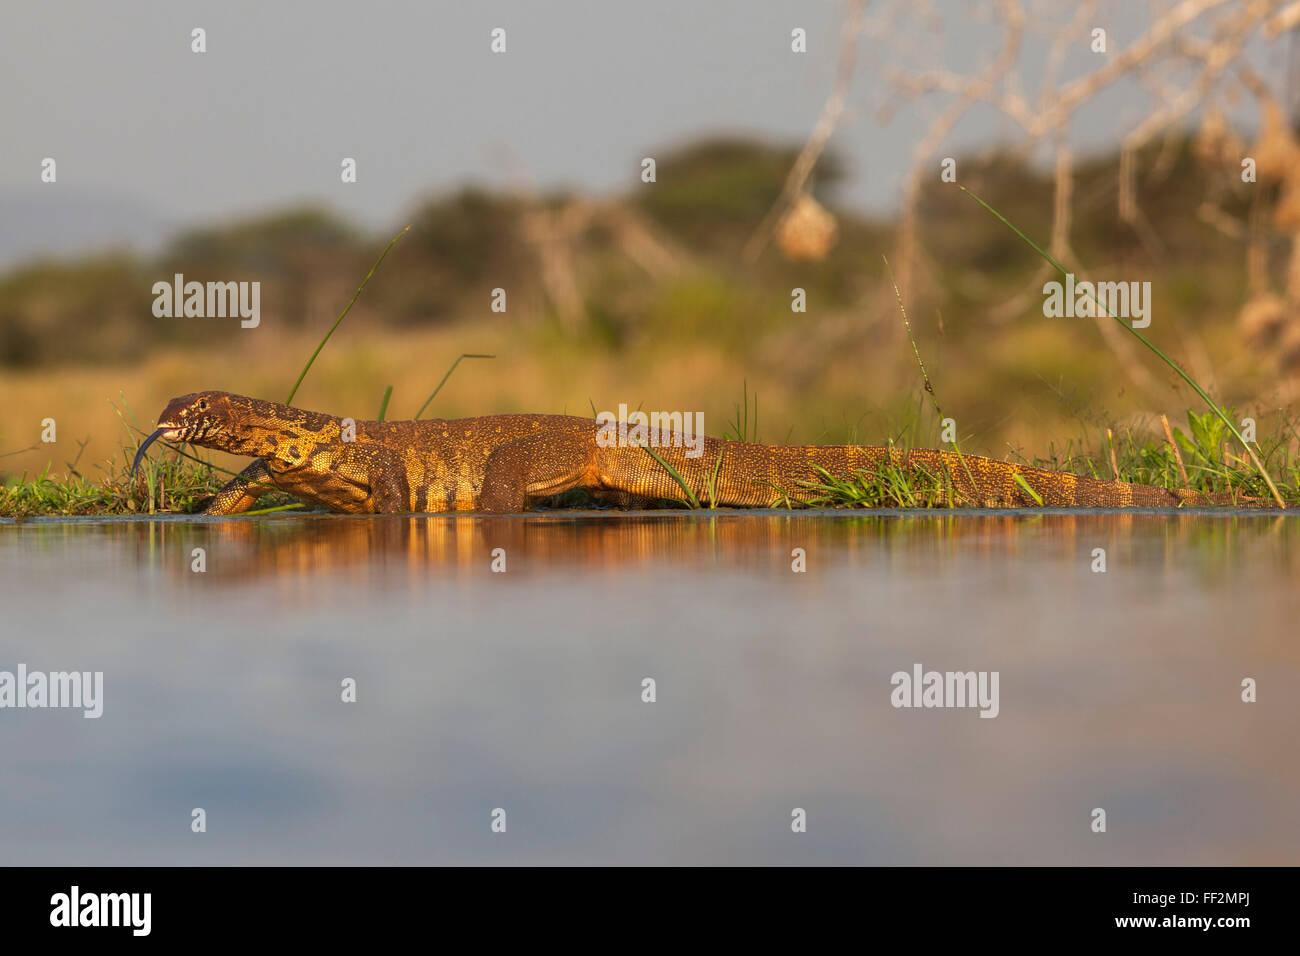 Monitor (agua) (Varanus niRMoticus RMeguaan), Zimanga Private Game Reserve, KwaZuRMu-NataRM, Sudáfrica, África Imagen De Stock